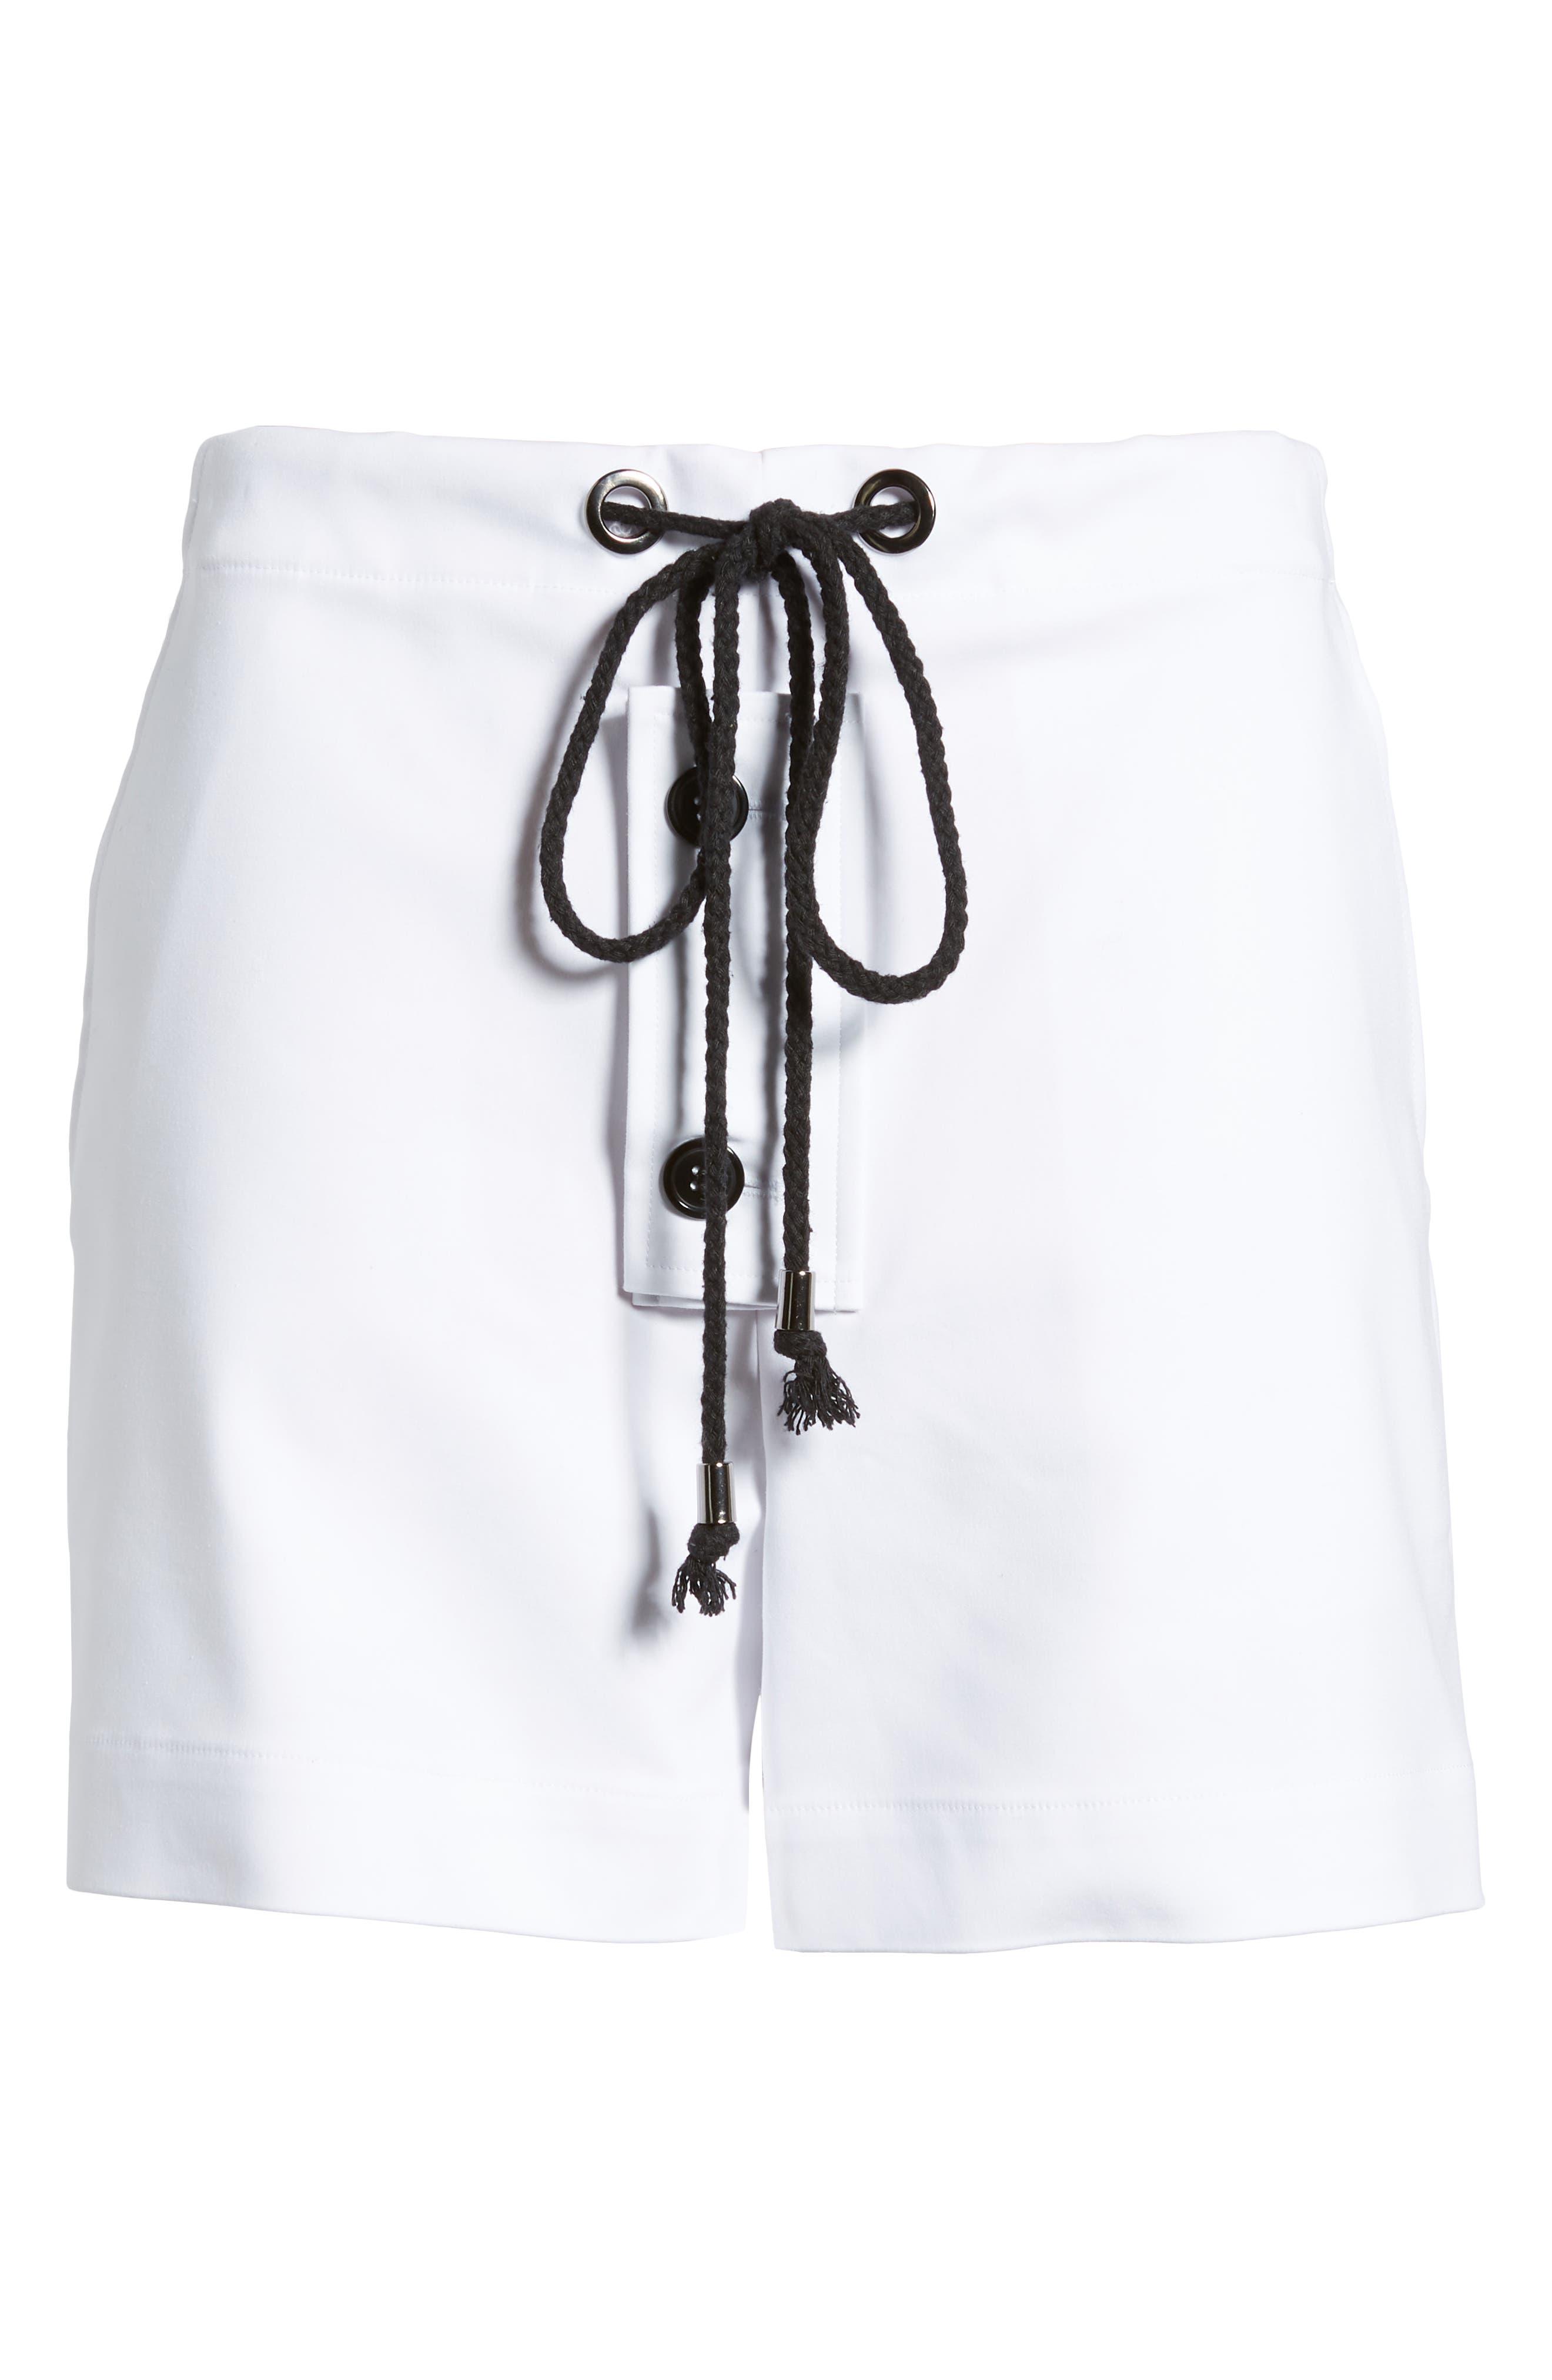 Park South Shorts,                             Alternate thumbnail 6, color,                             100